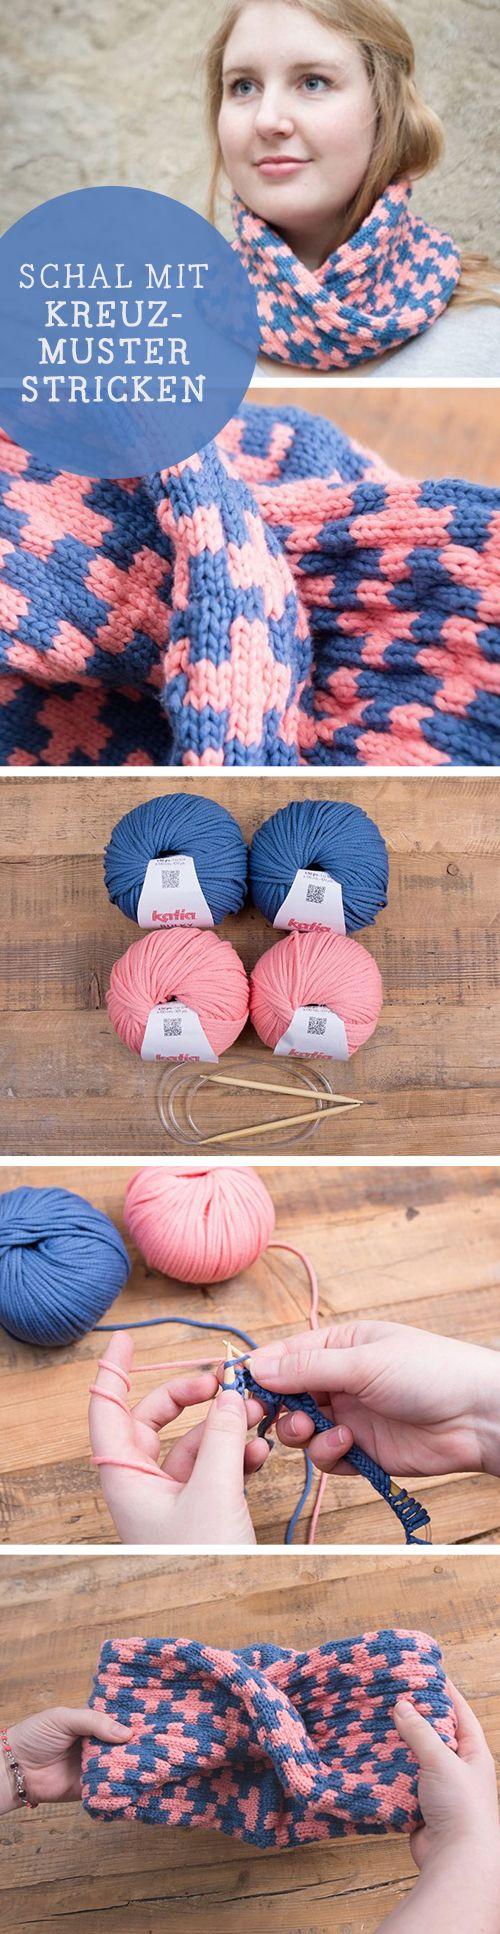 DIY-Anleitung für einen Loop-Schal mit angesagtem Kreuzmuster / diy tutorial for knitted loop scarf, modern pattern via DaWanda.com